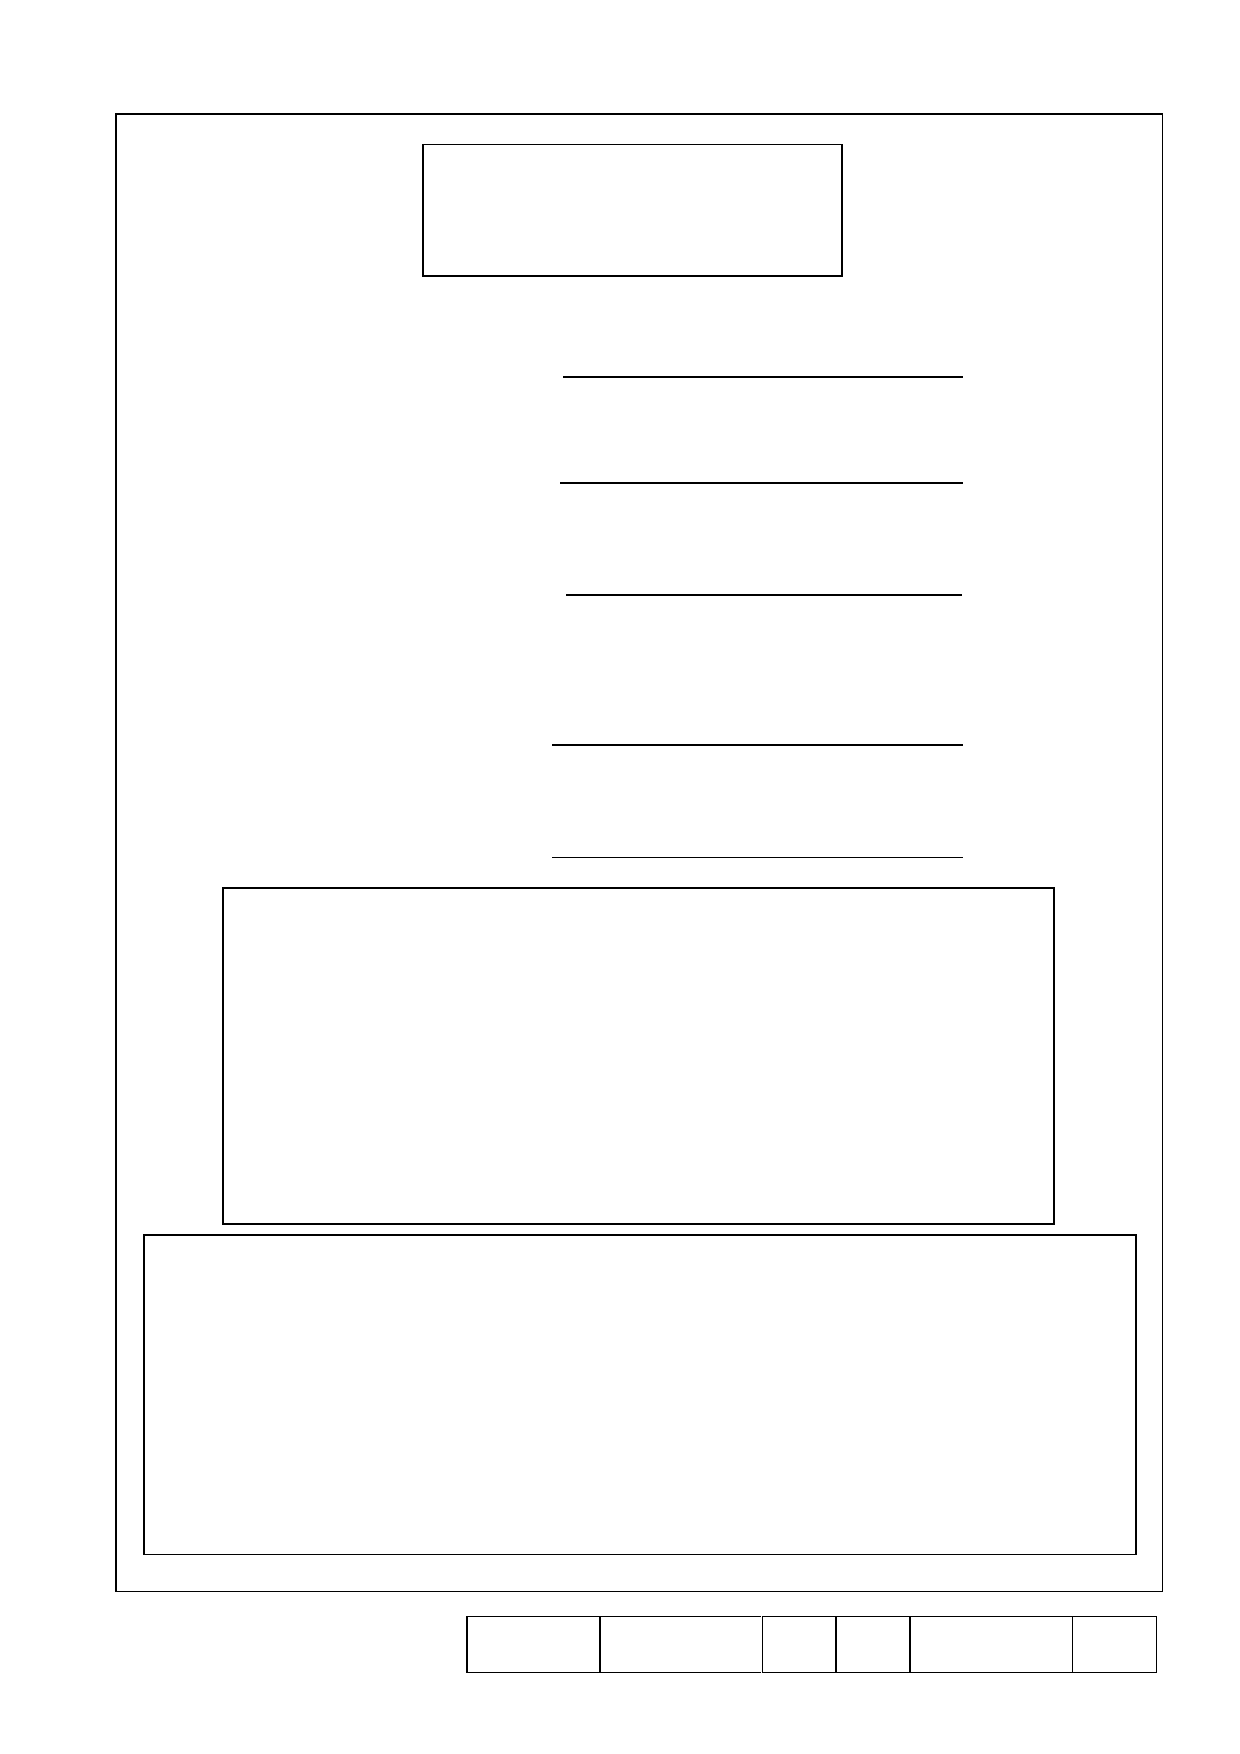 US18650VTC5A دیتاشیت PDF